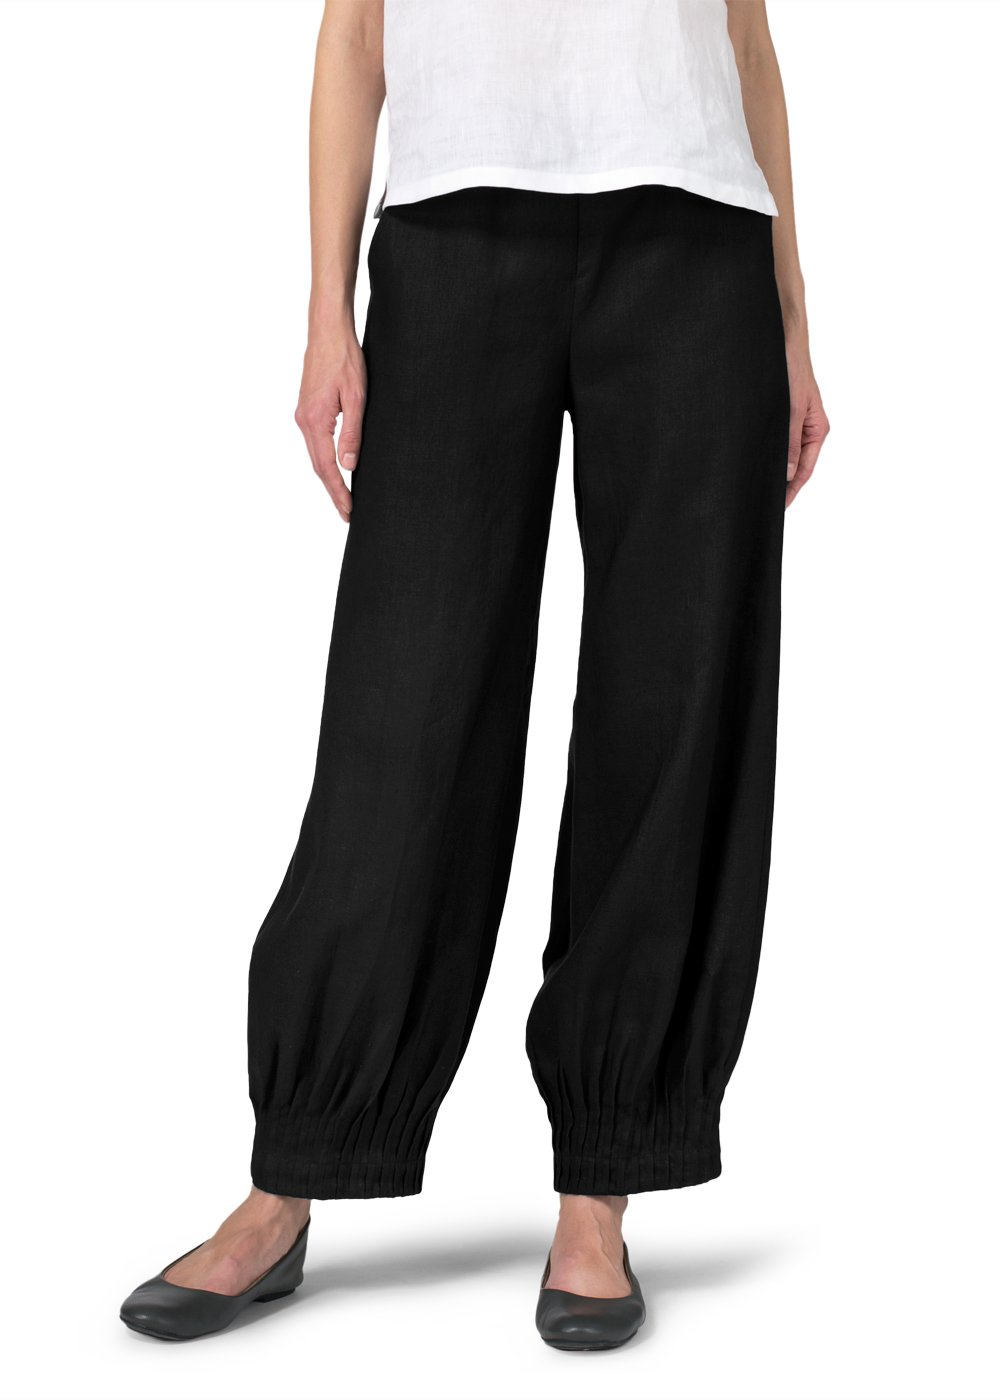 Vivid Linen Pleated Cuff Ankle Length Pants-S-Black